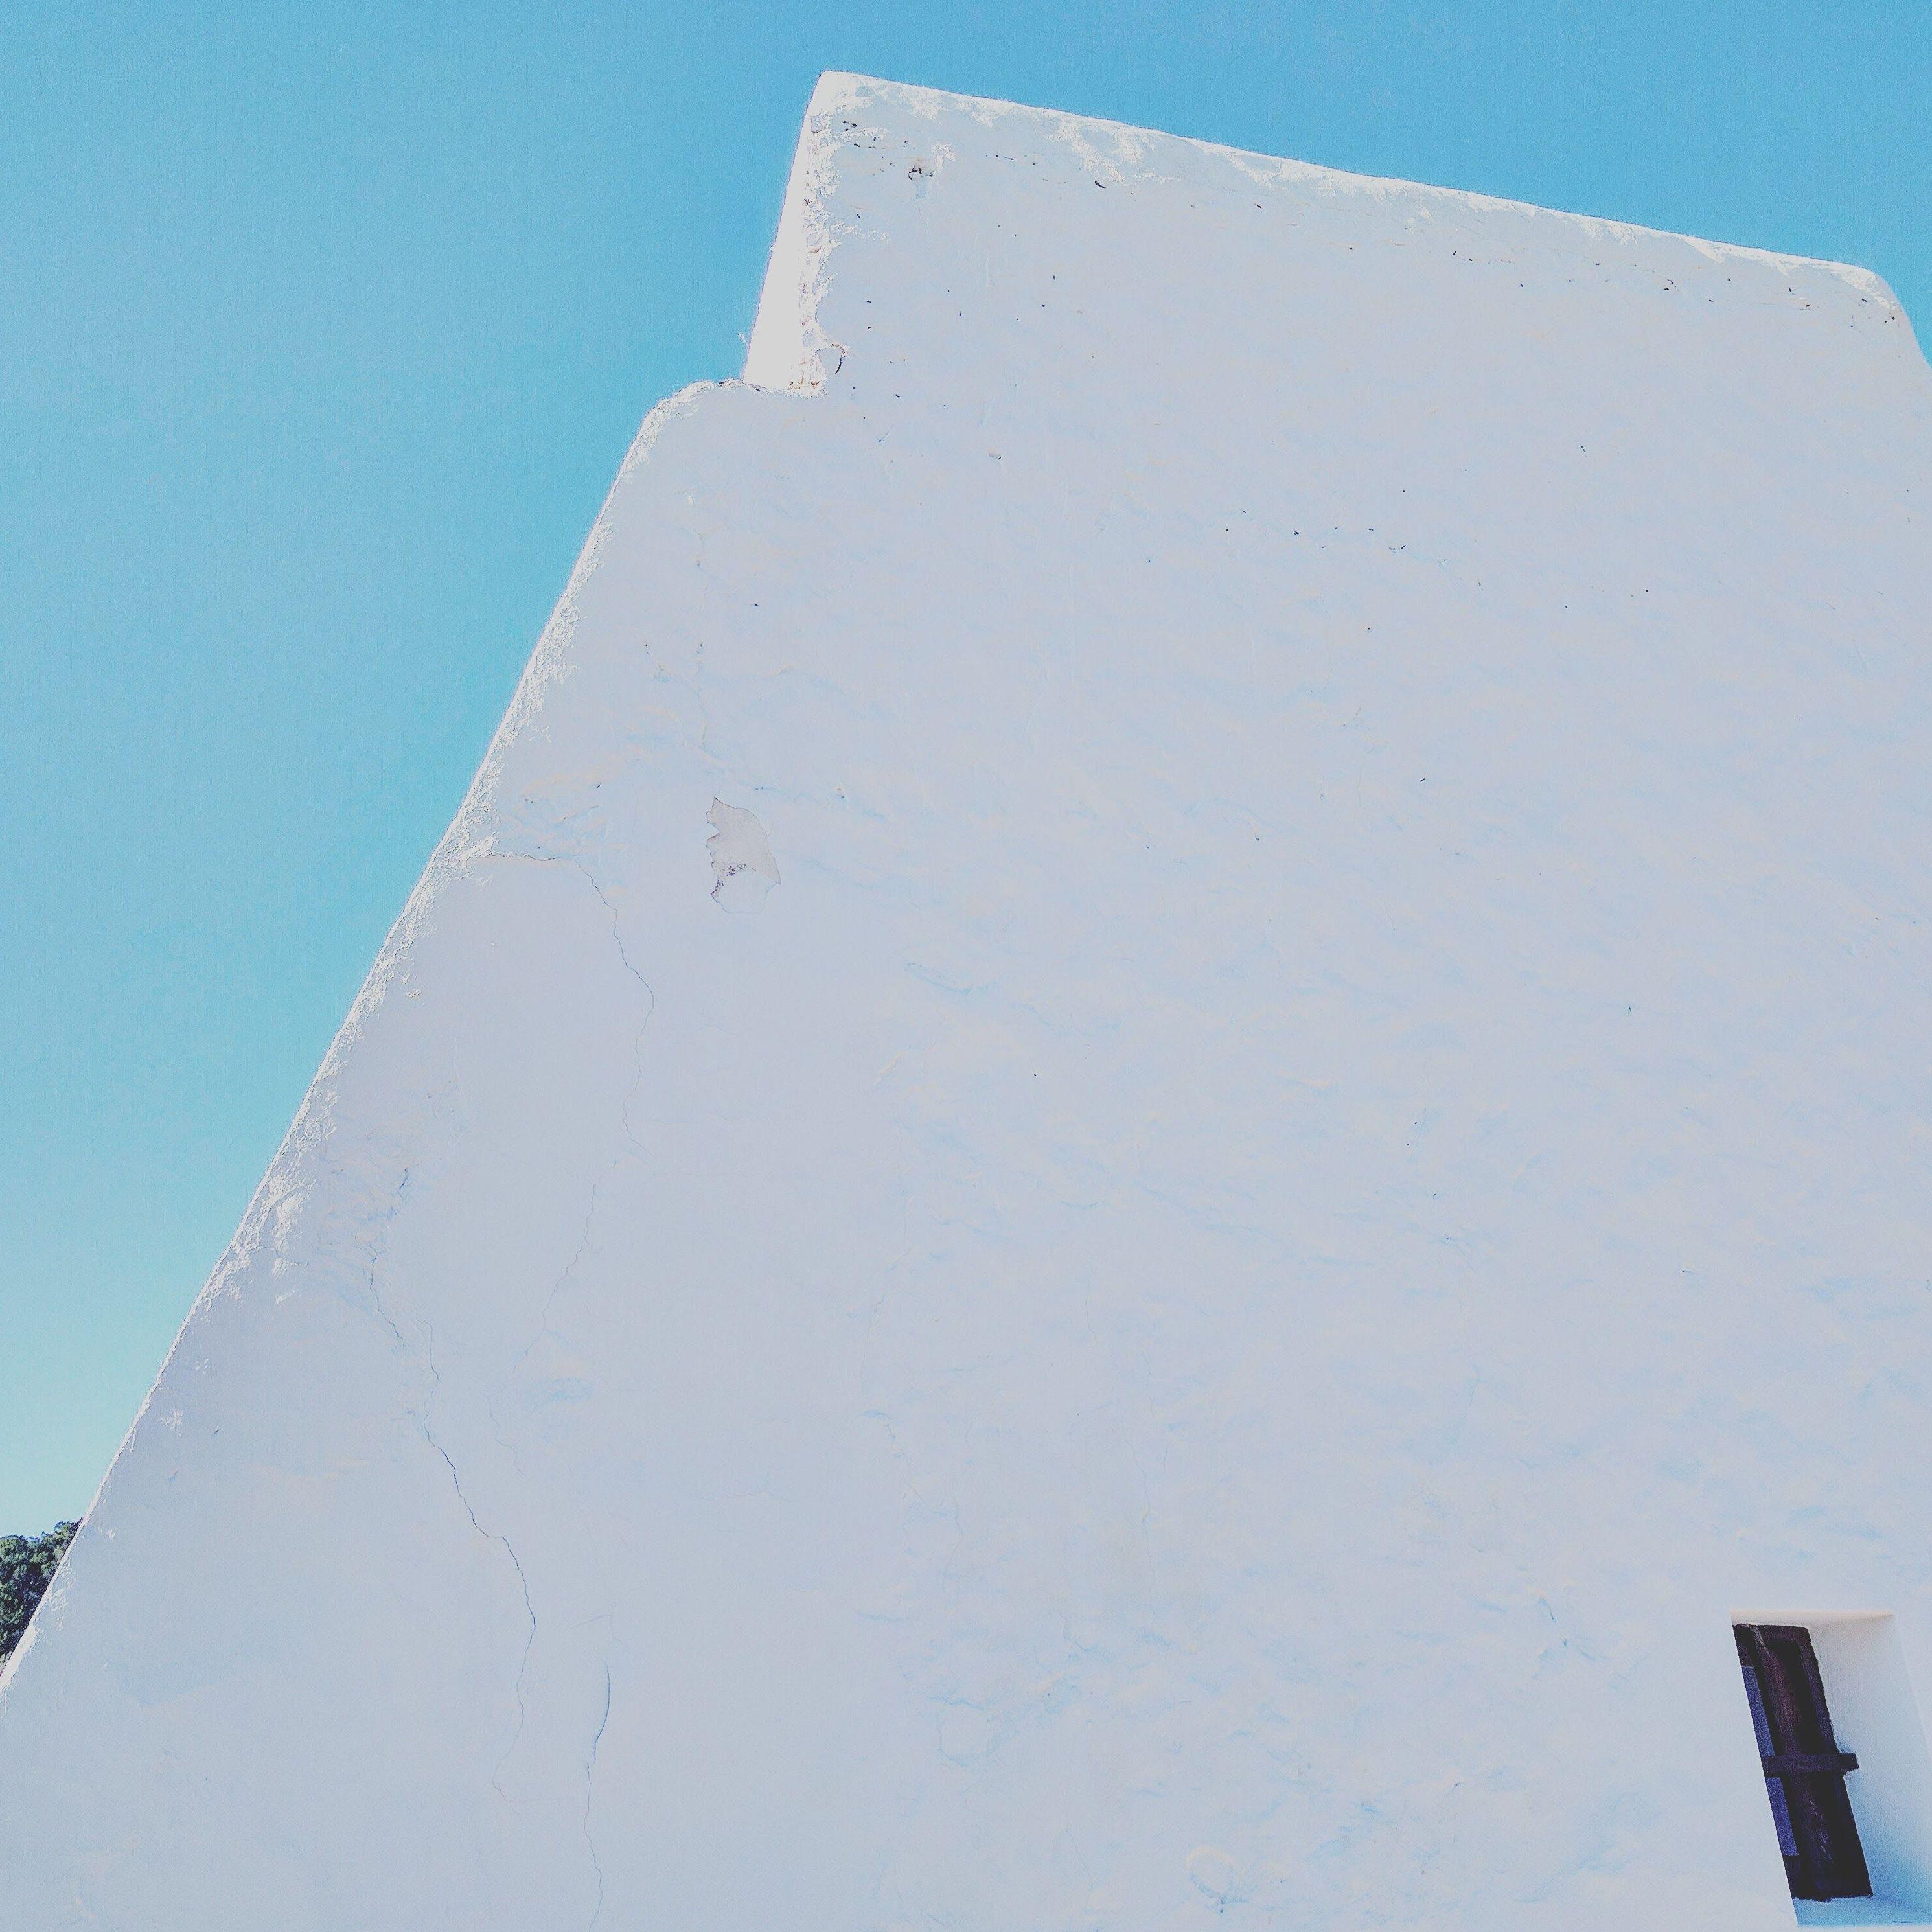 Foto 50 de Abogados en Eivissa | Raad Abogados. Tel 691 270 993